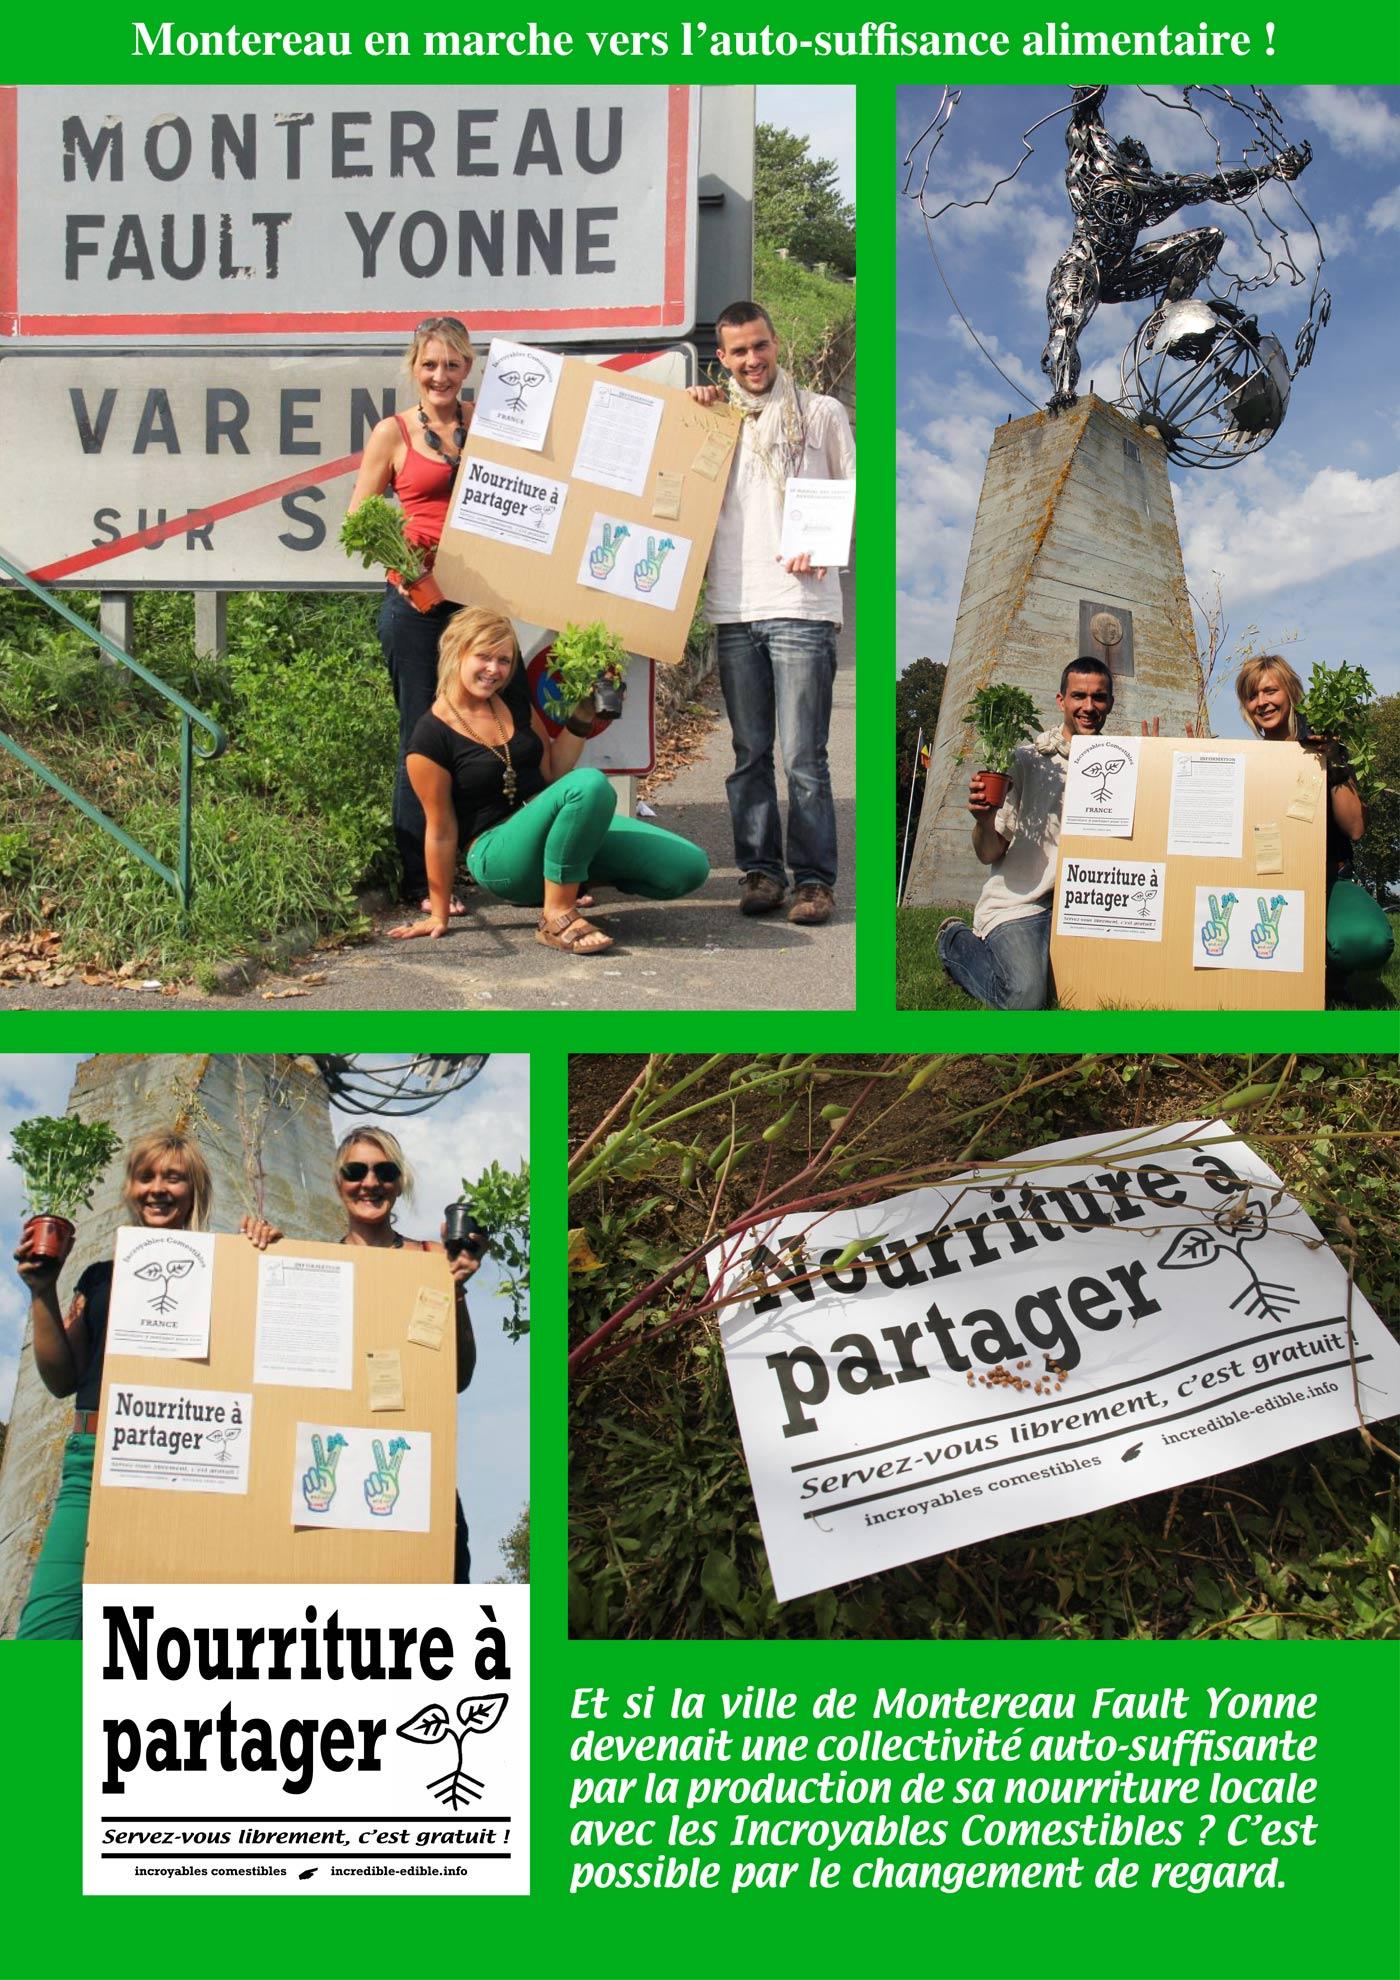 c623_incredible_edible_todmorden_france_seine-et-marne_montereau-fault-yonne_agriculture_urbaine_incroyables_comestibles_w1400